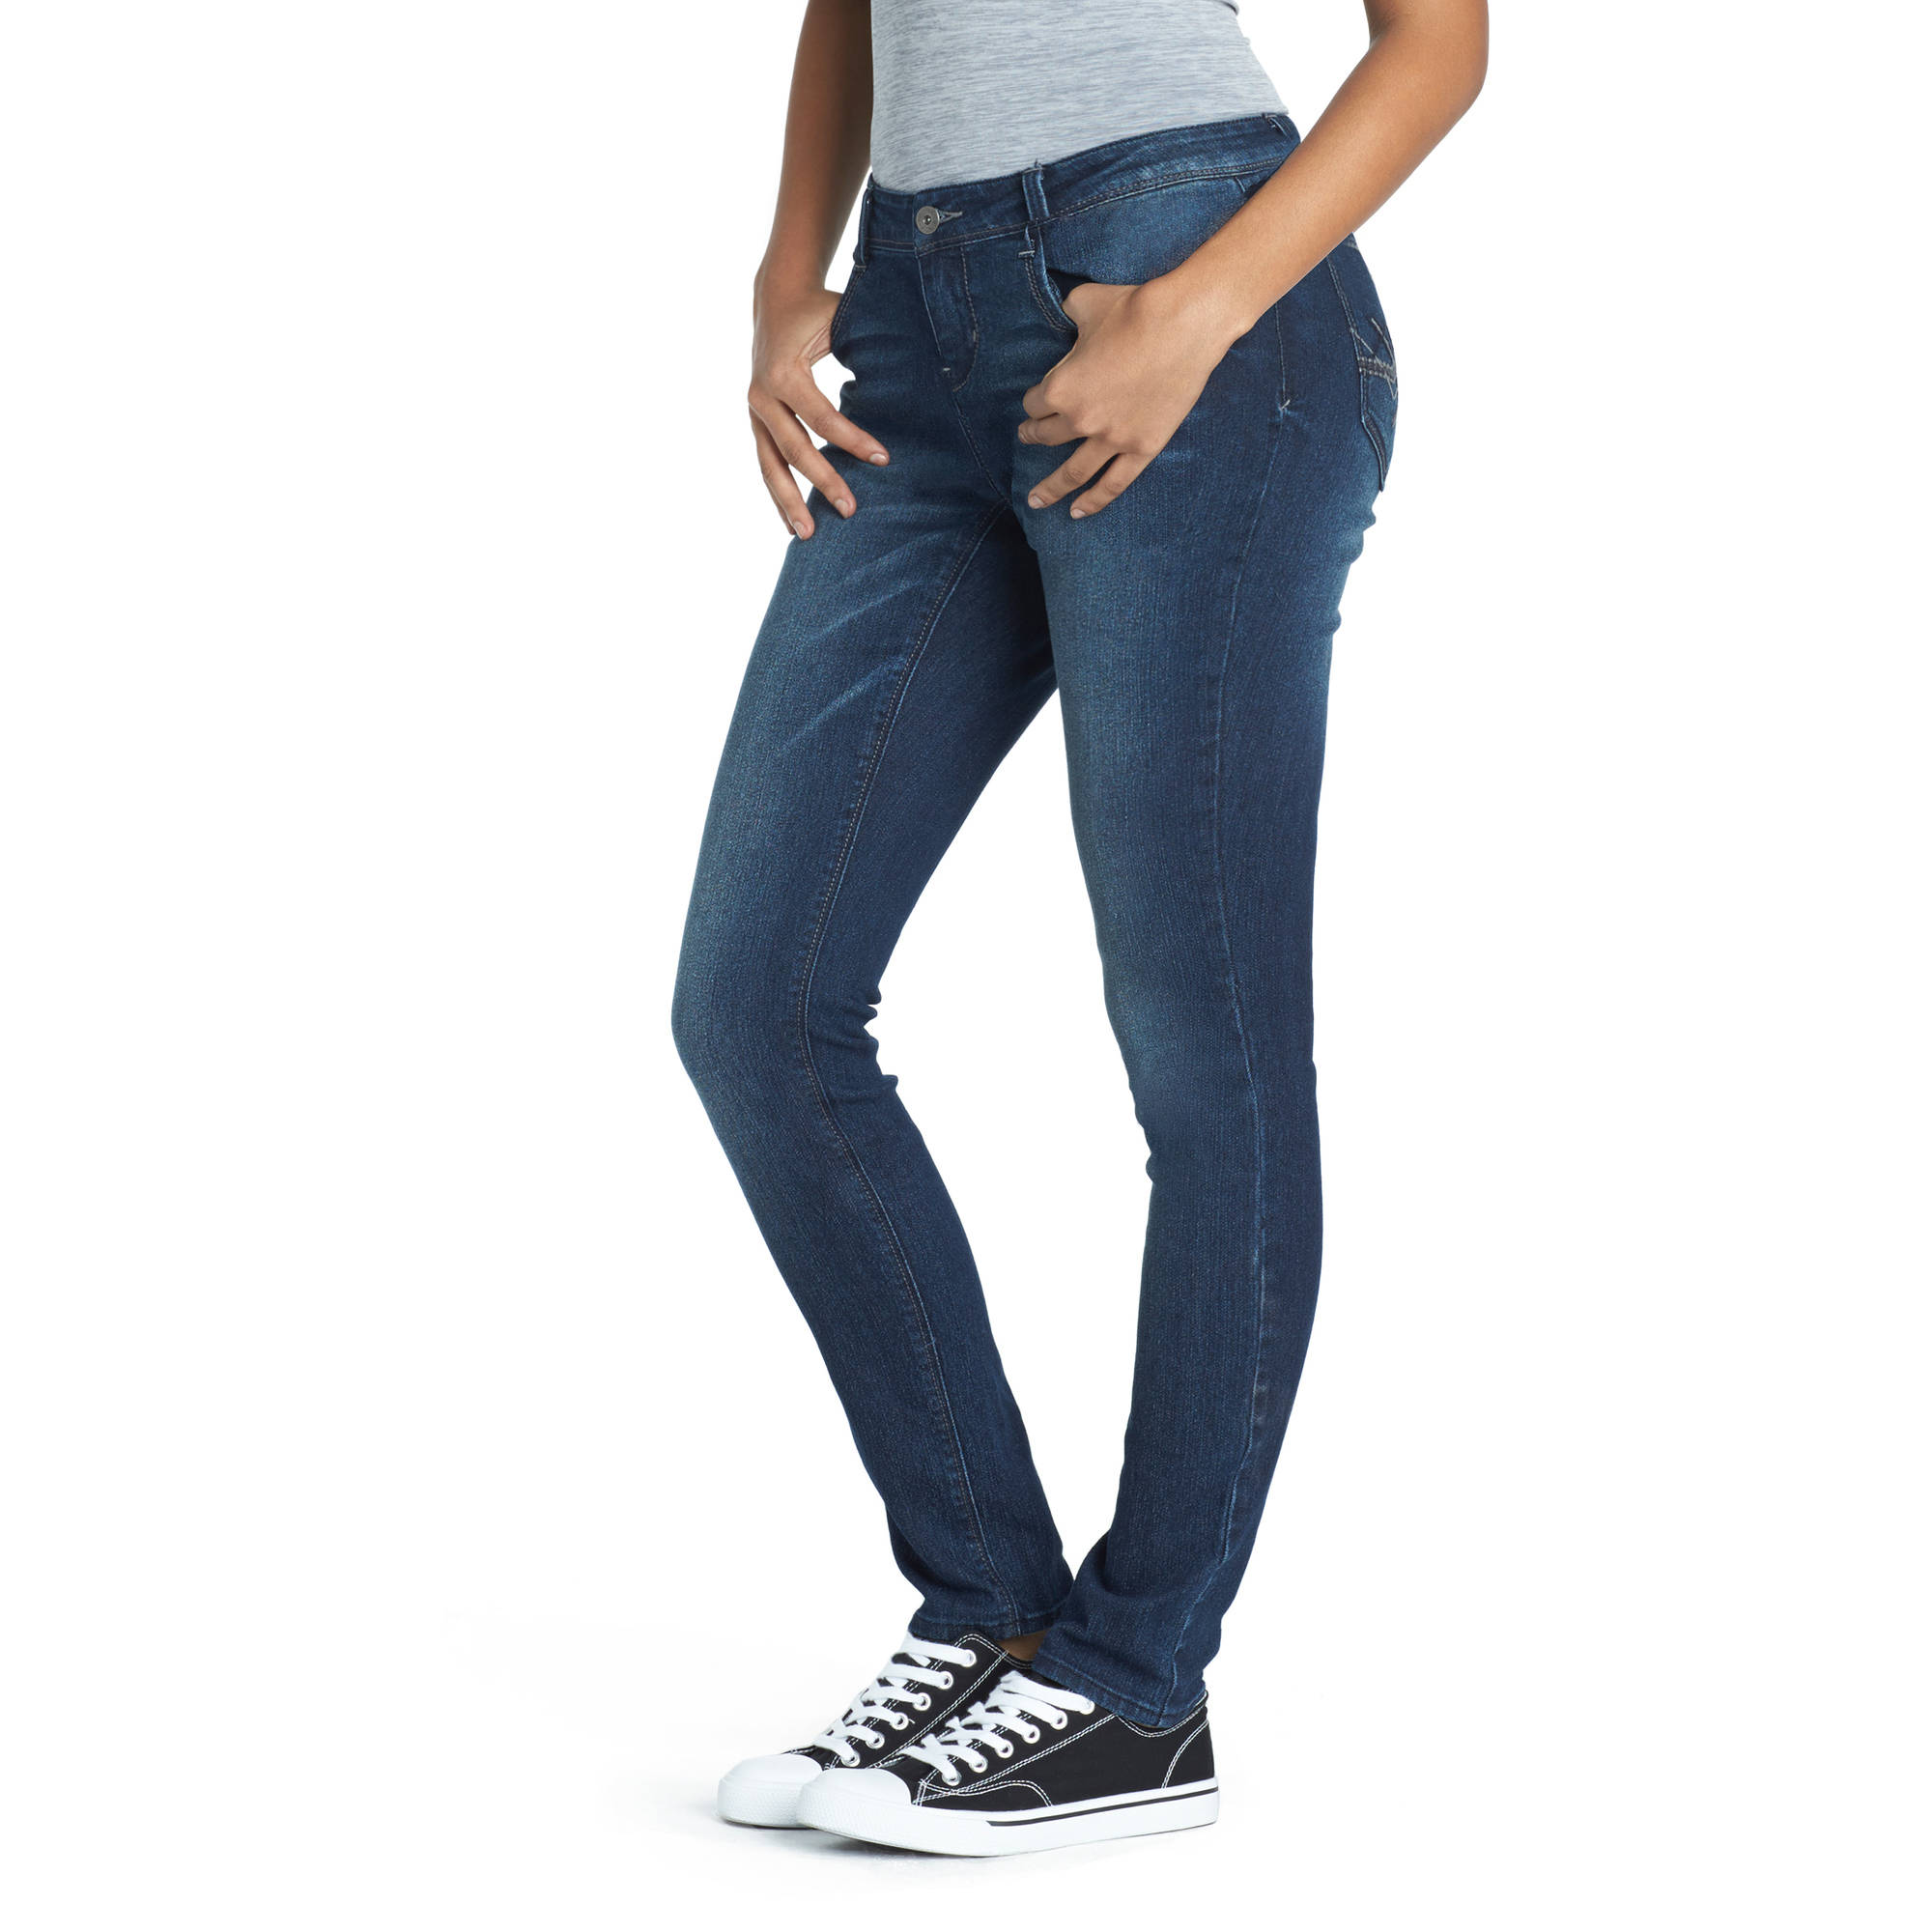 L.E.I. Juniors' Curvy Skinny Jeans